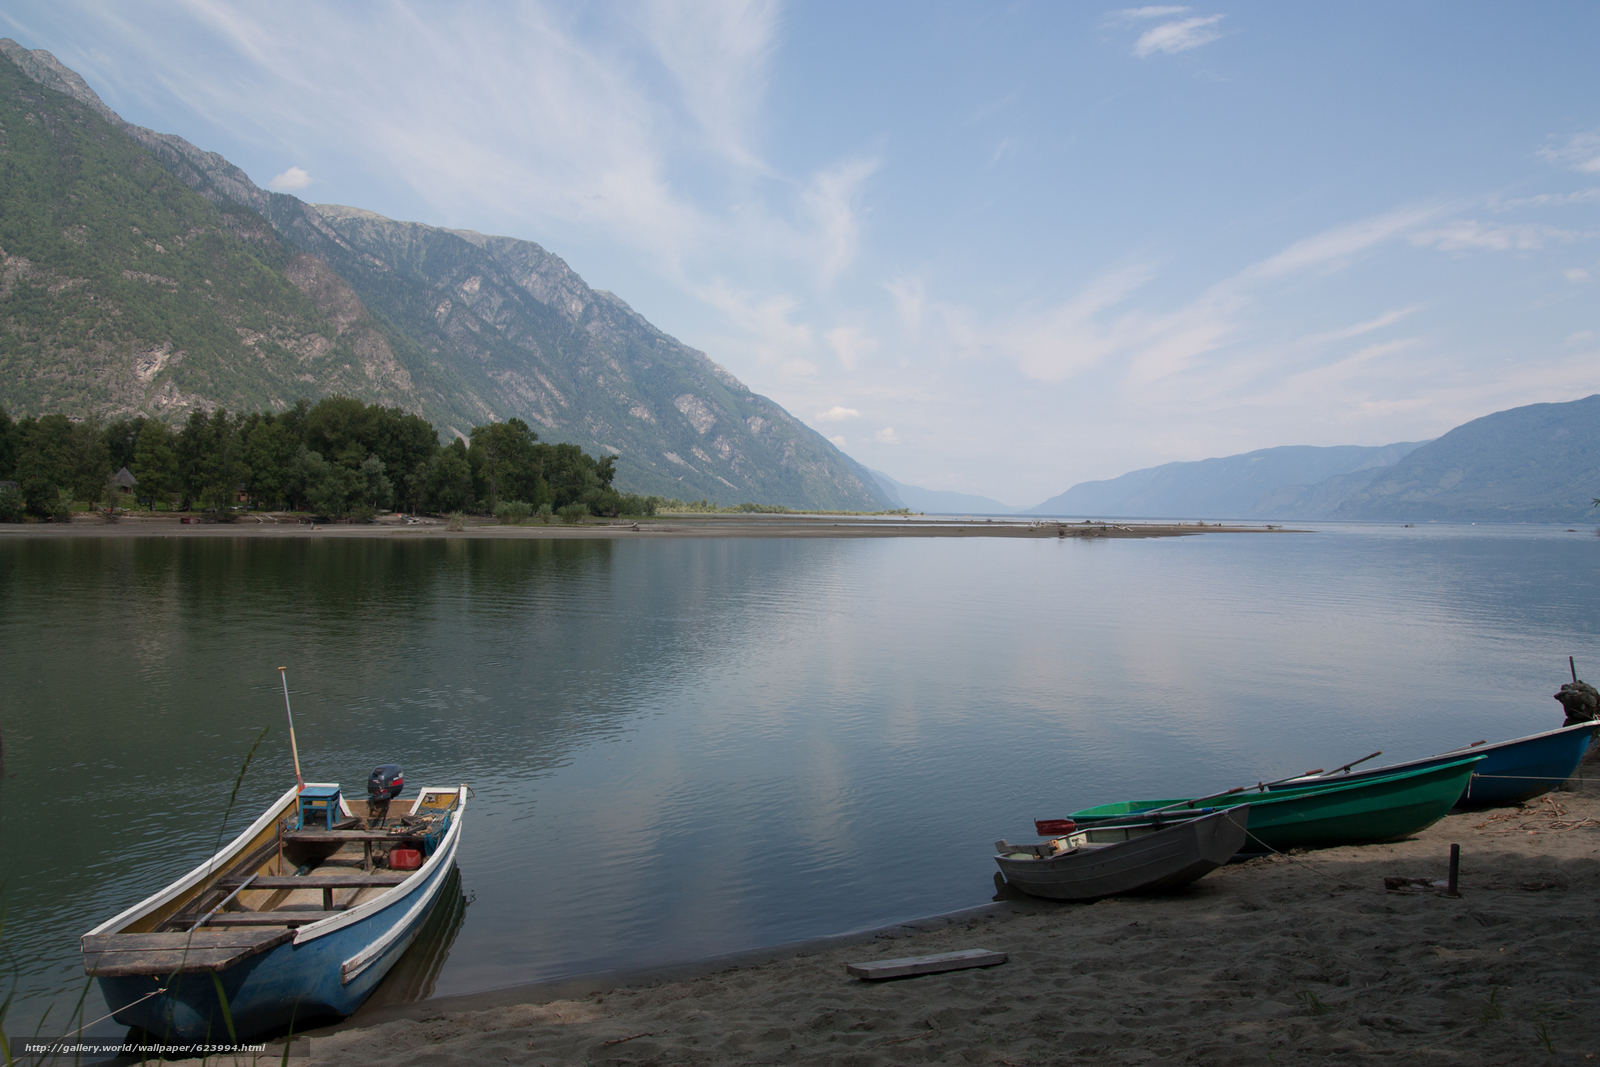 Descargar gratis Lago Teletskoe,  Altai,  Rusia,  costa Fondos de escritorio en la resolucin 2145x1430 — imagen №623994